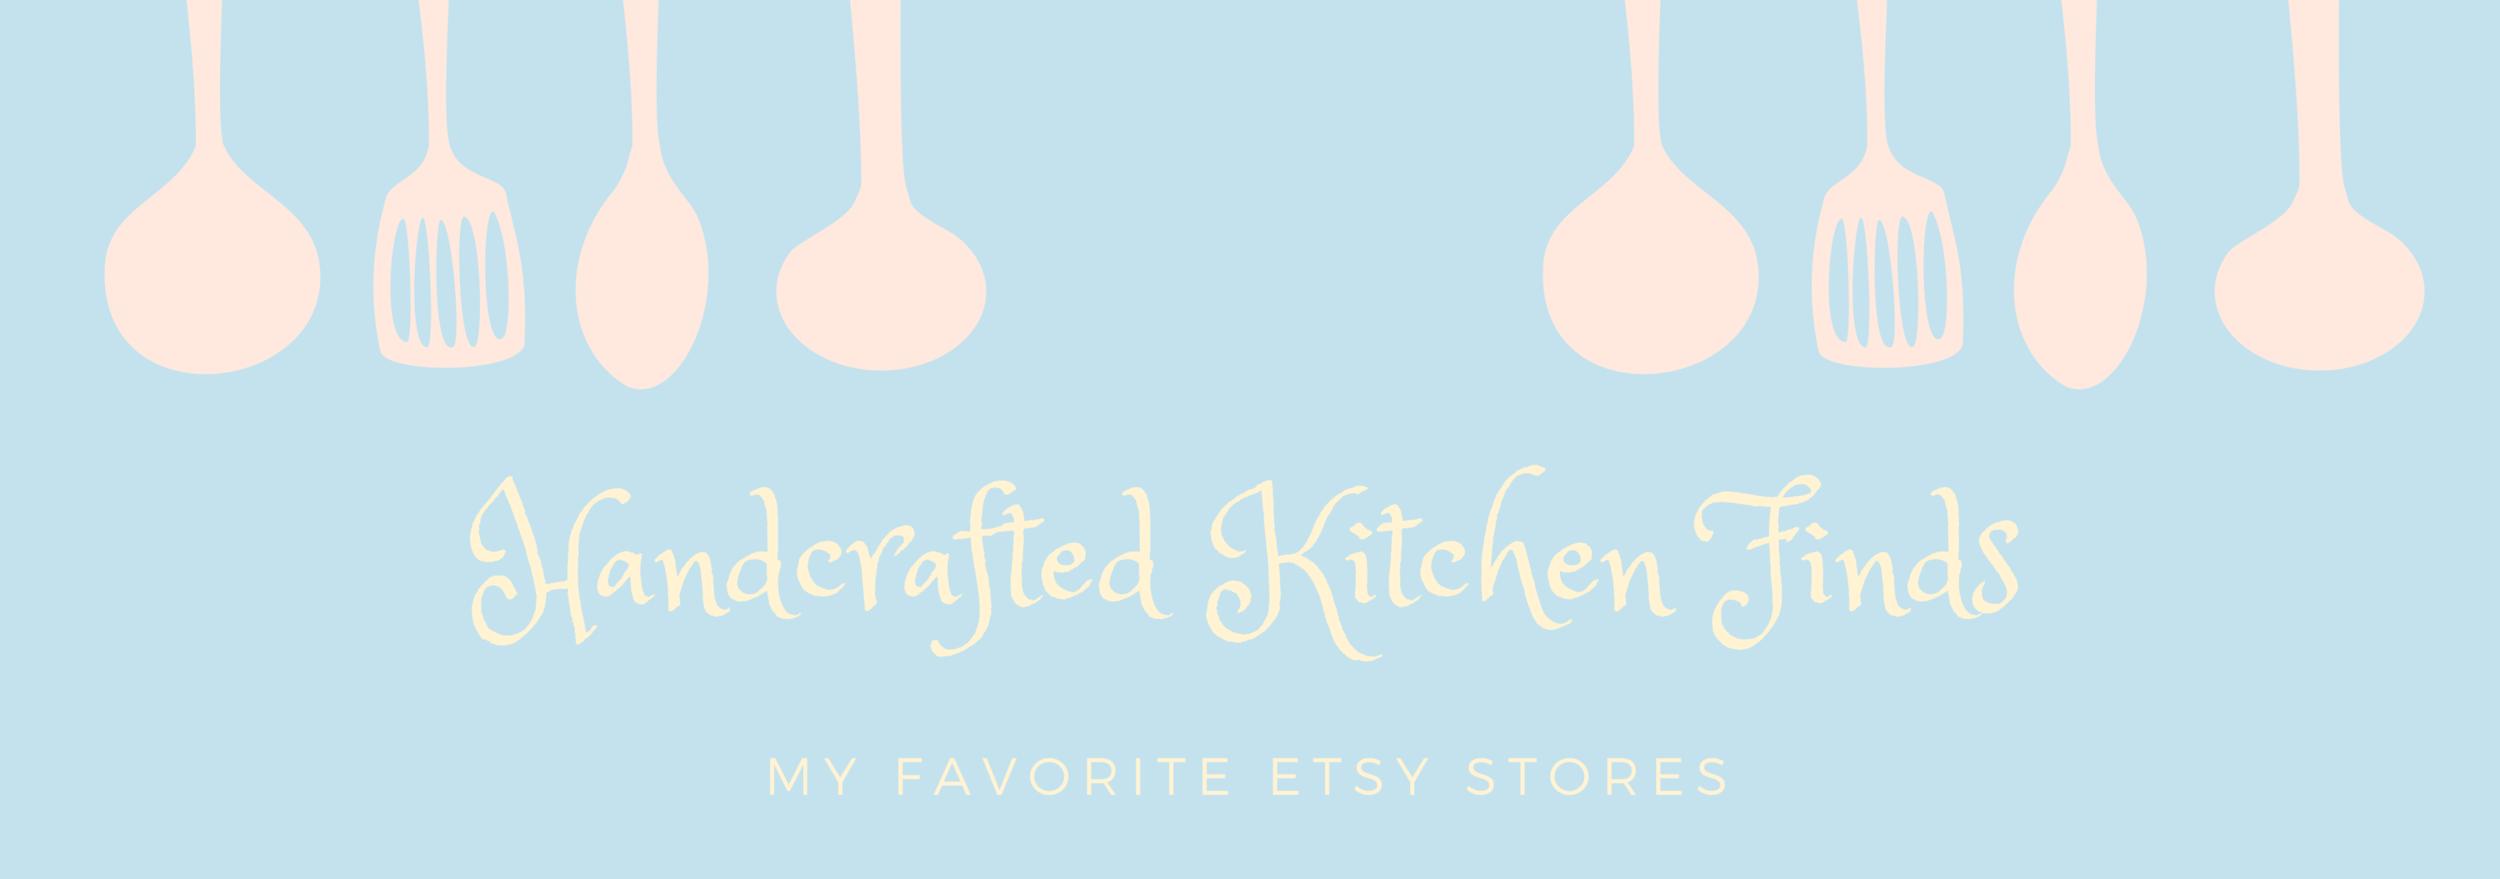 Etsy Kitchen Finds